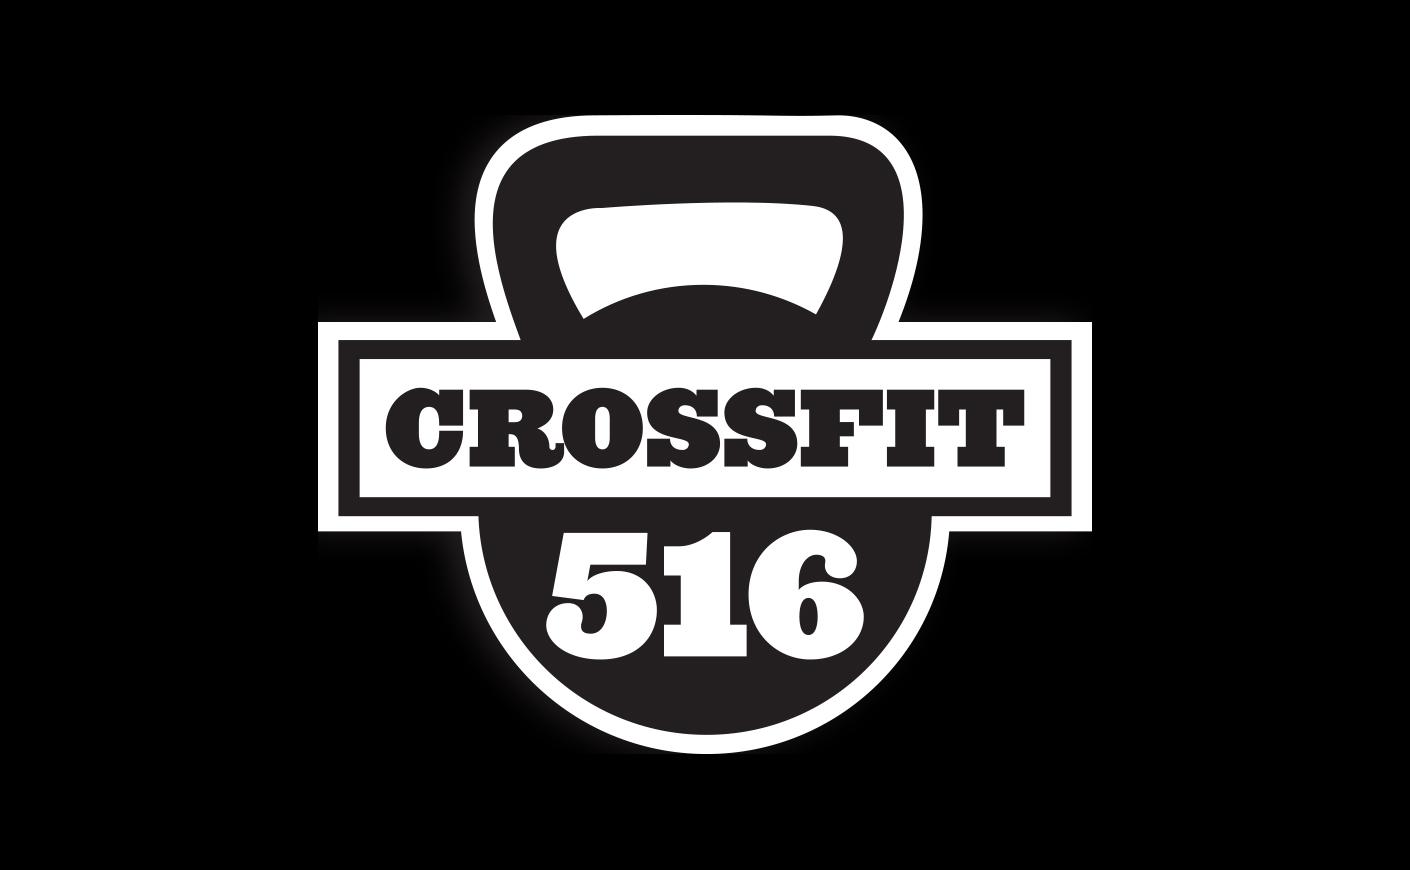 crossfit-wall-logo